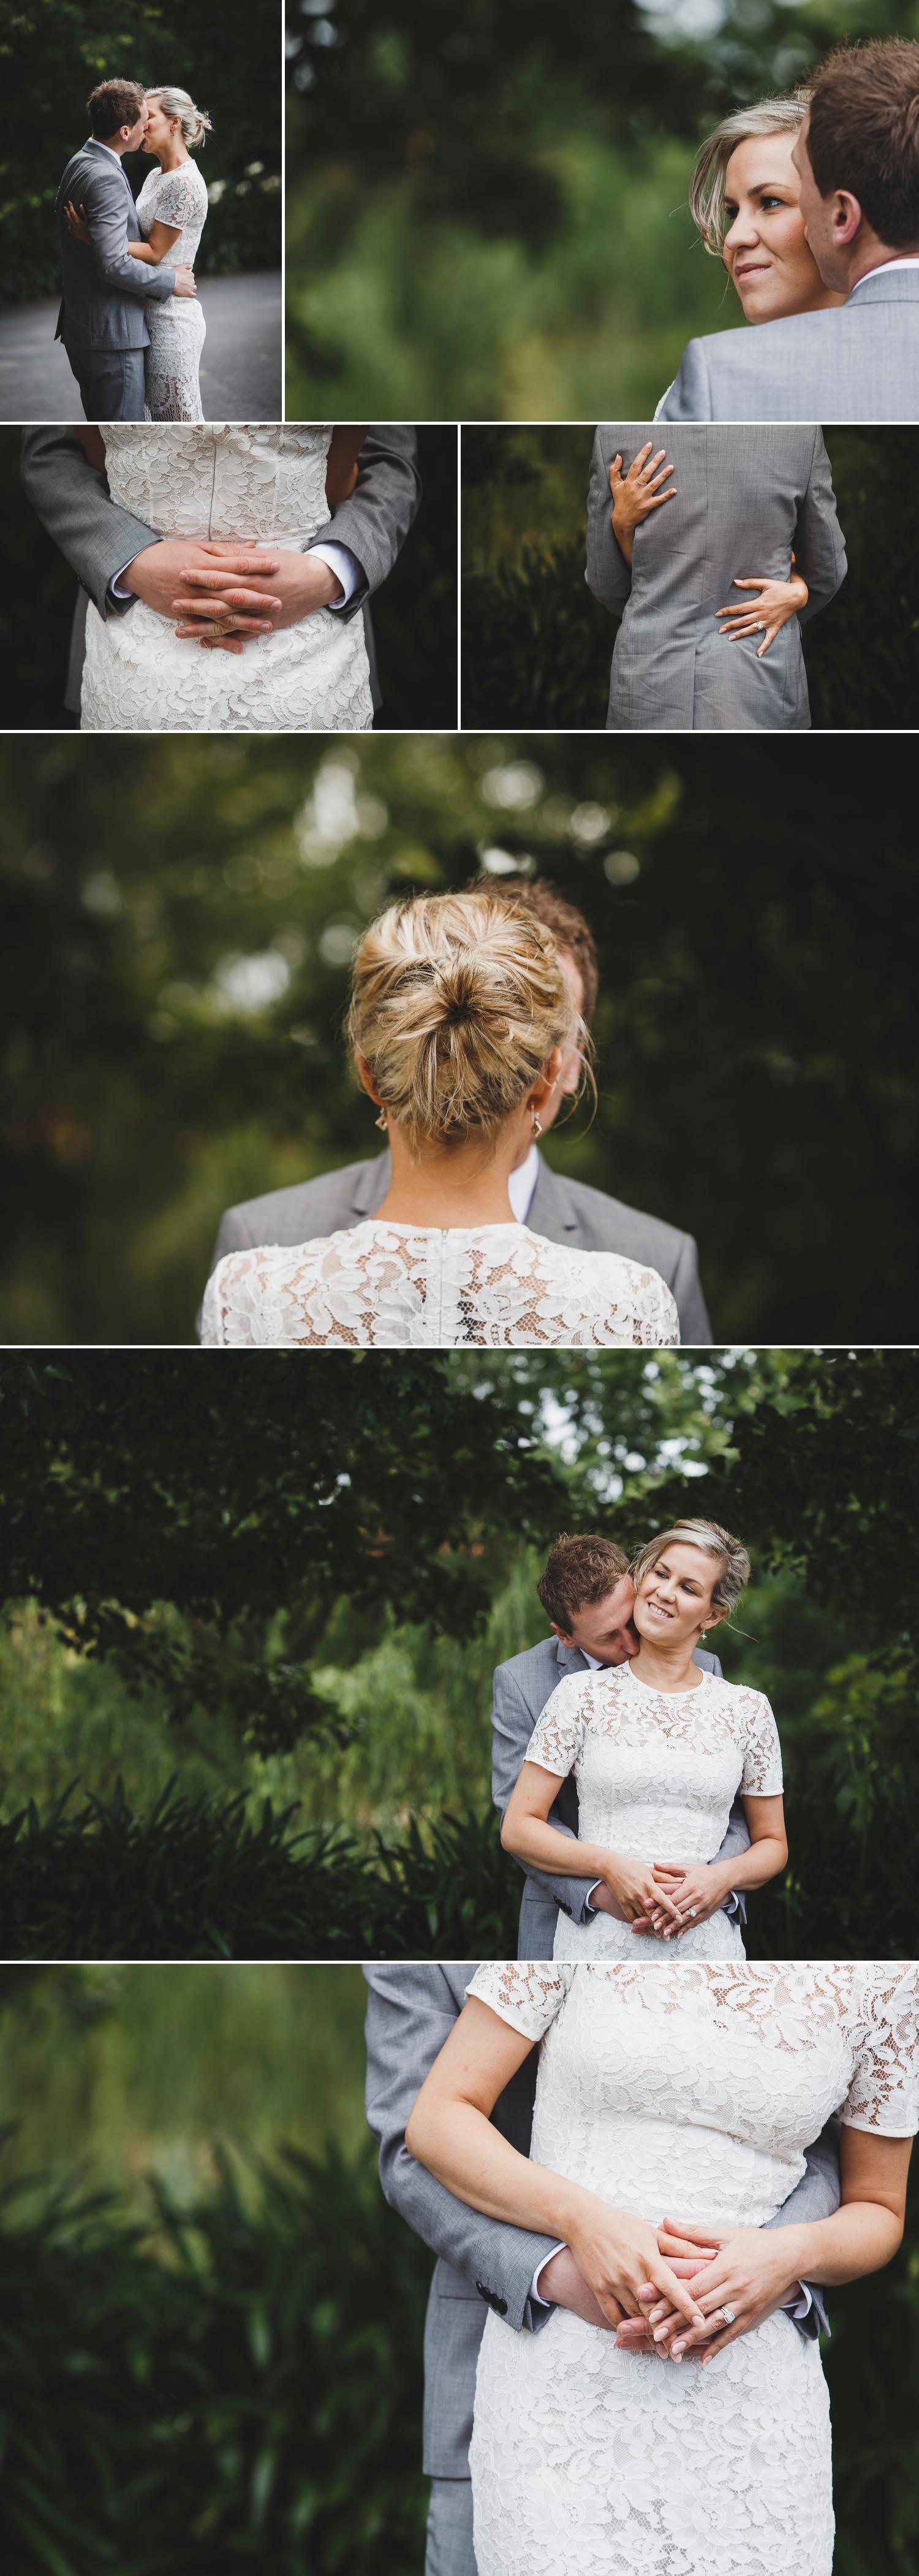 Beautiful Garden Wedding Morwell Gippsland, Bride and Groom Embracing, Wedding Flowers Photo by Danae Studios